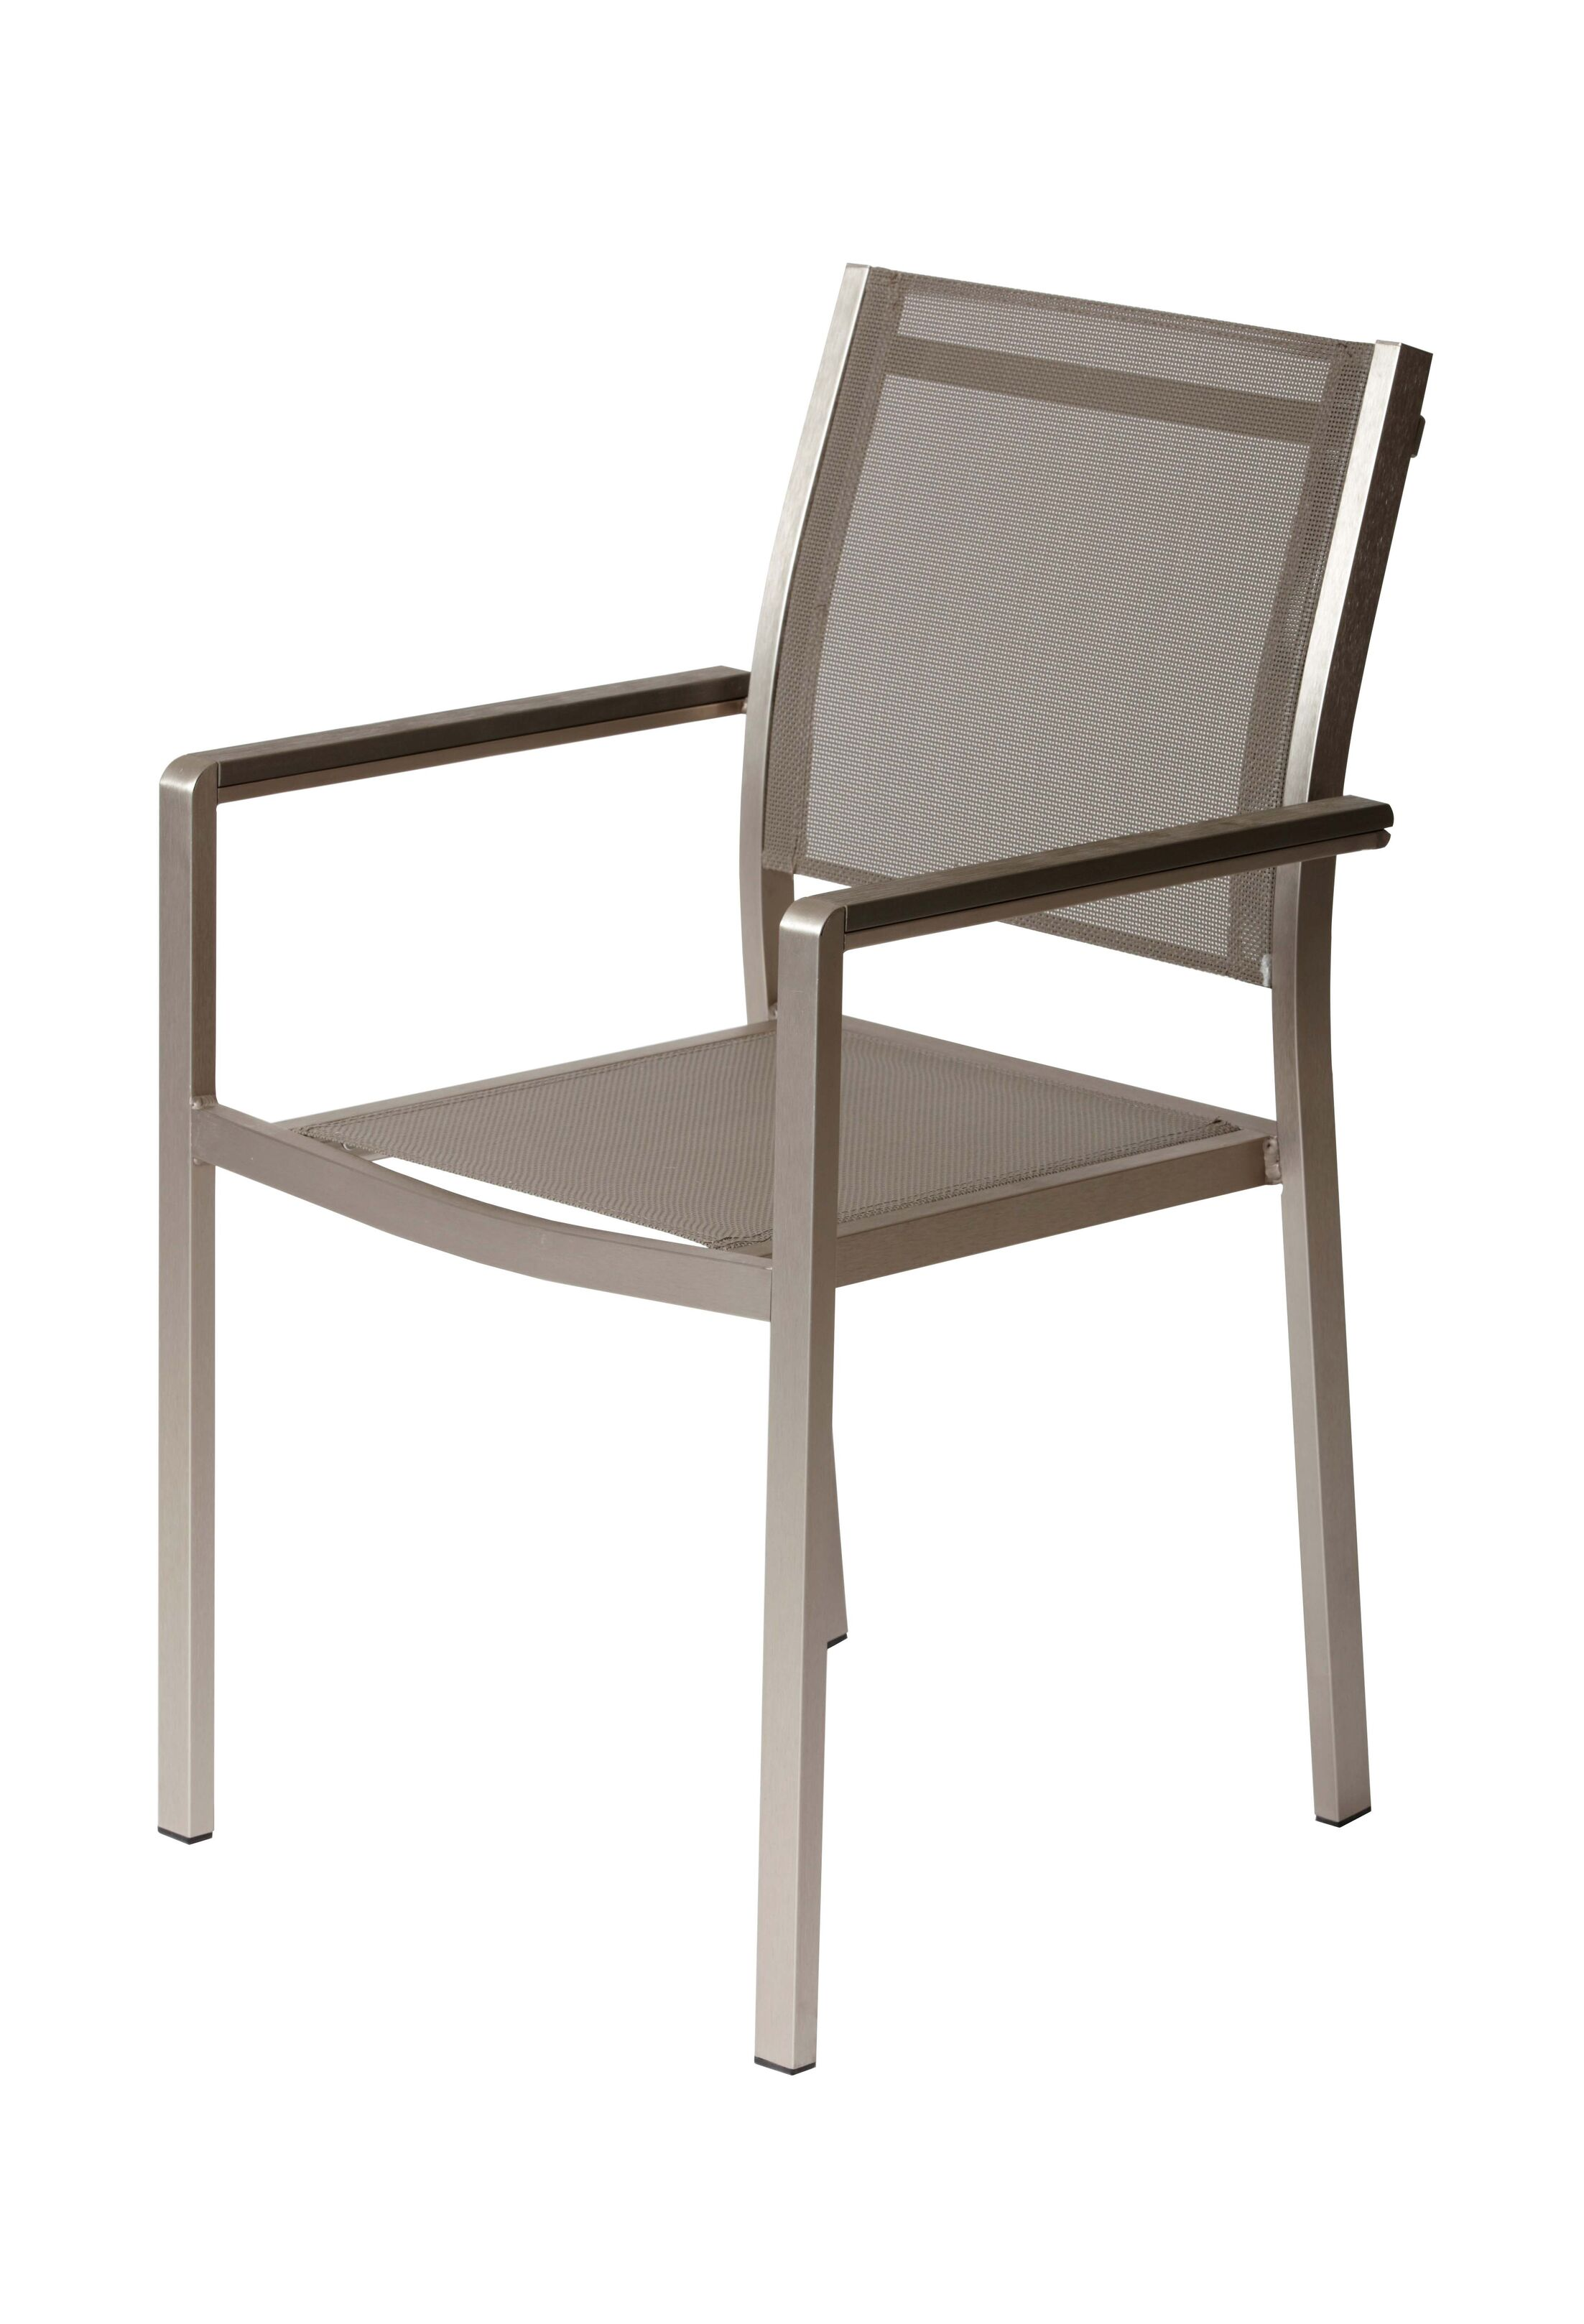 Alaia 7 Piece Dining Set Top Color: White, Leg Finish: Brushed Aluminum